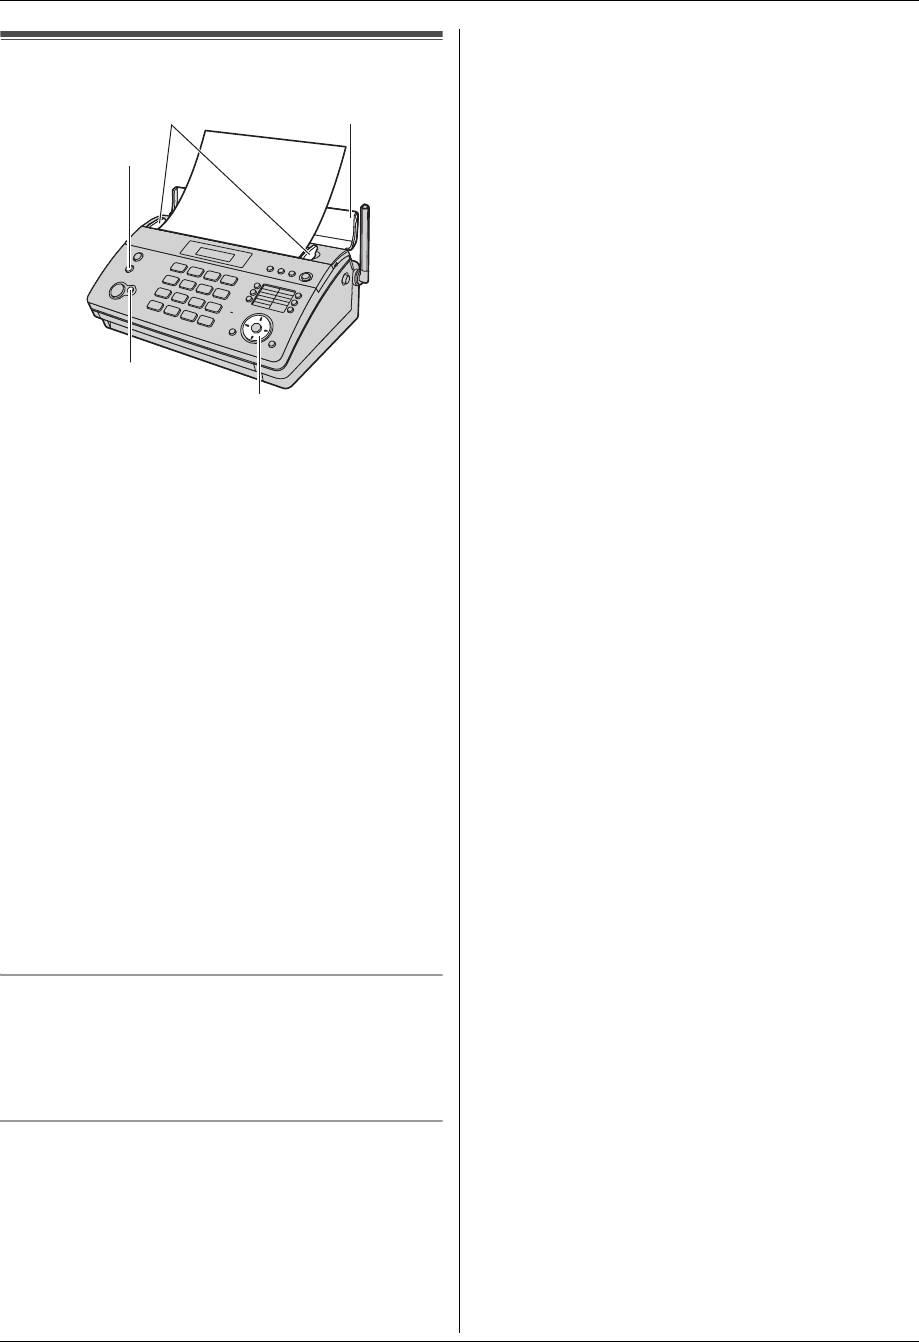 Факсимильный Аппарат (Факс) Panasonic KX-FC968RU. 6.1